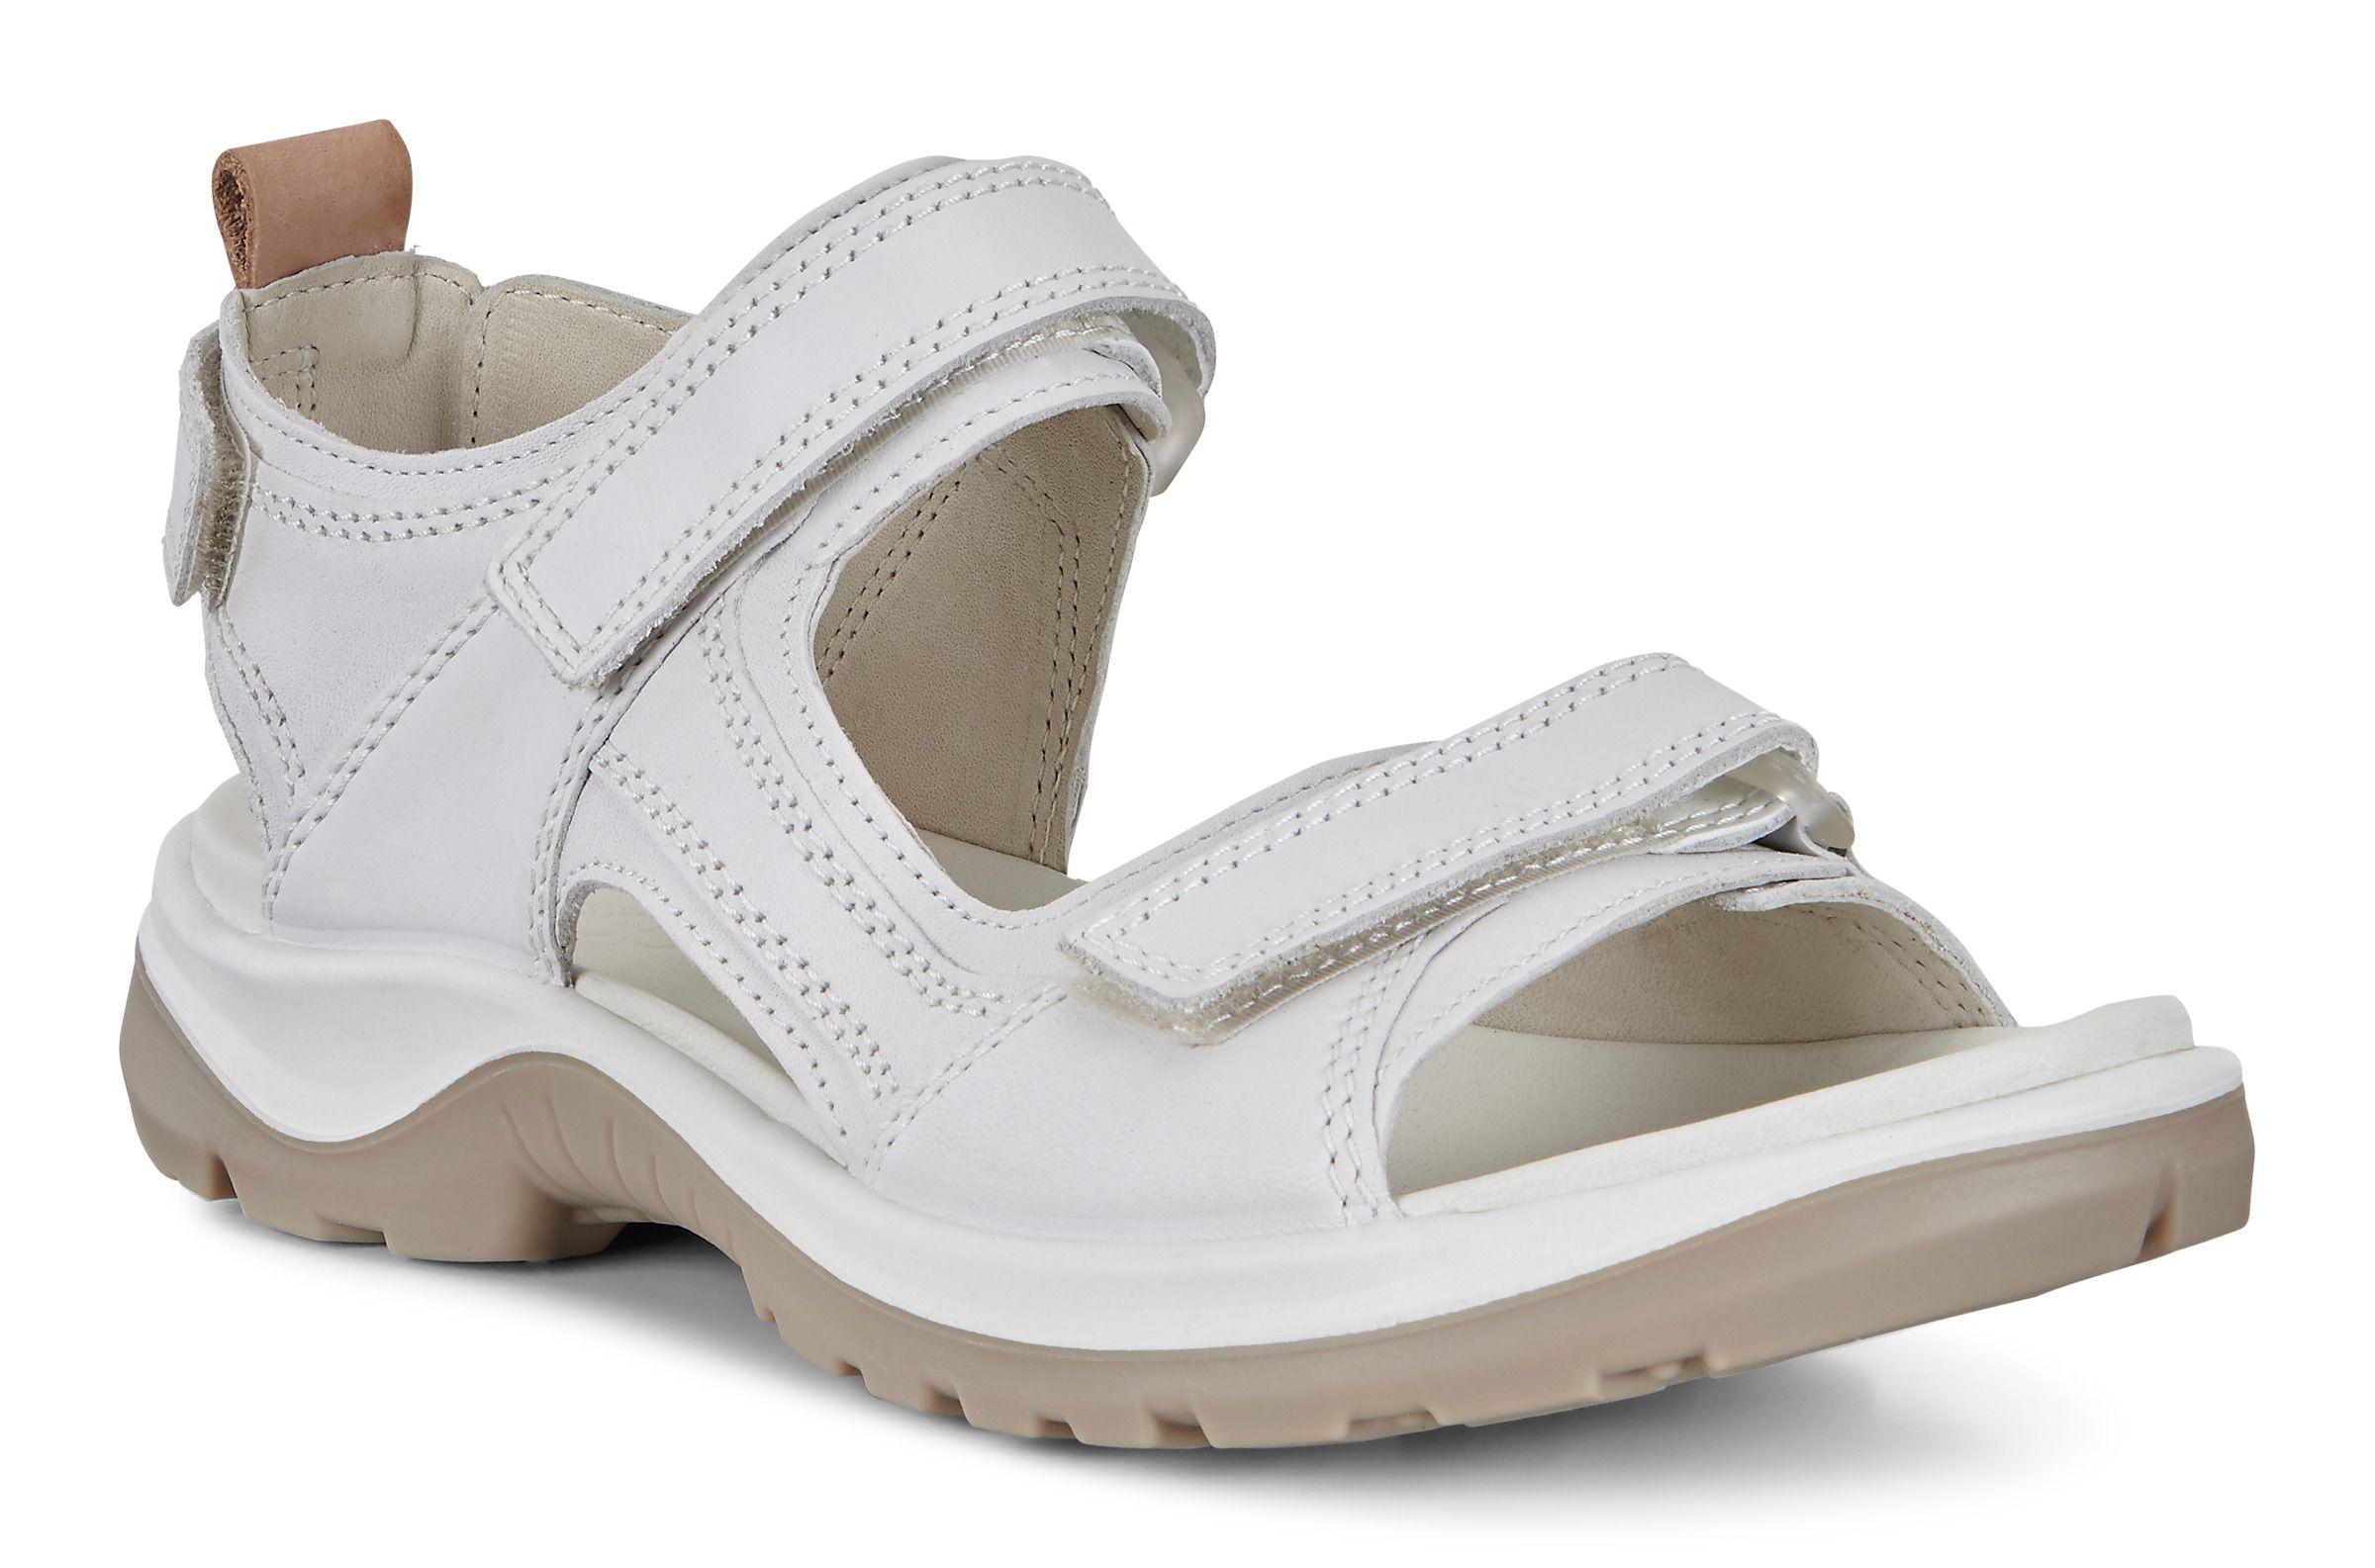 ecco ecco shoes, Women Beach Shoes ecco CRUISE Flip flops